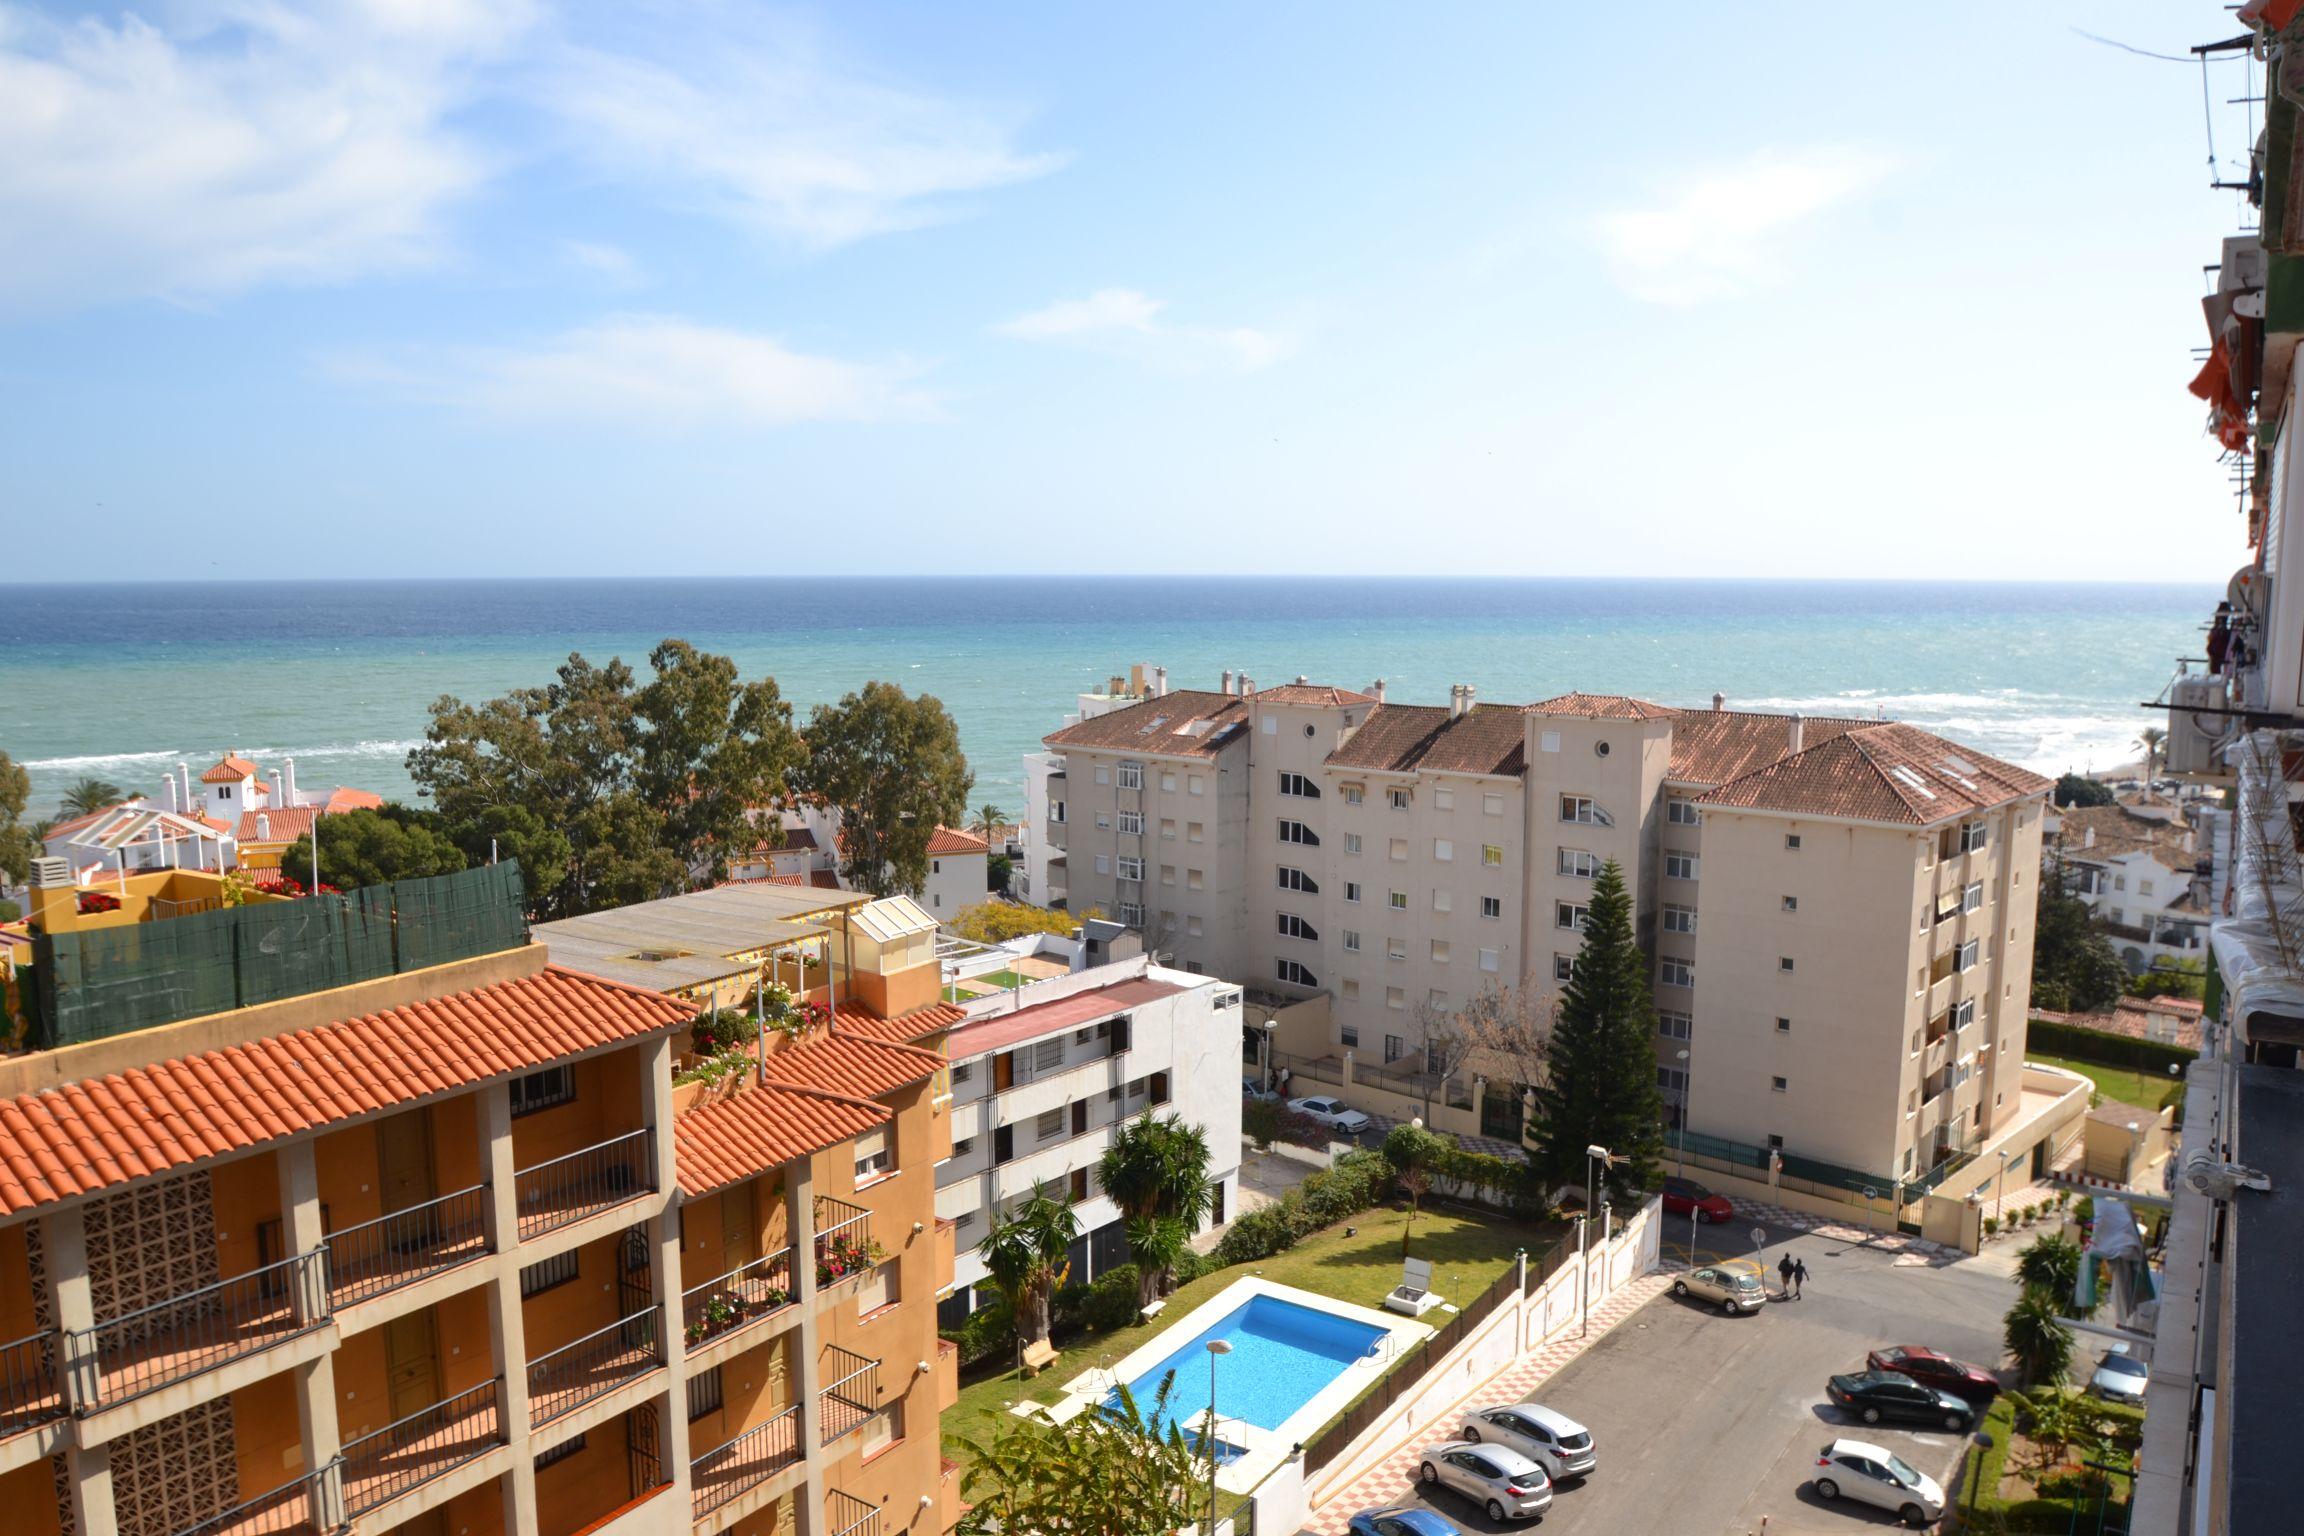 Apartamento en segunda línea de playa en Benalmádena costa.